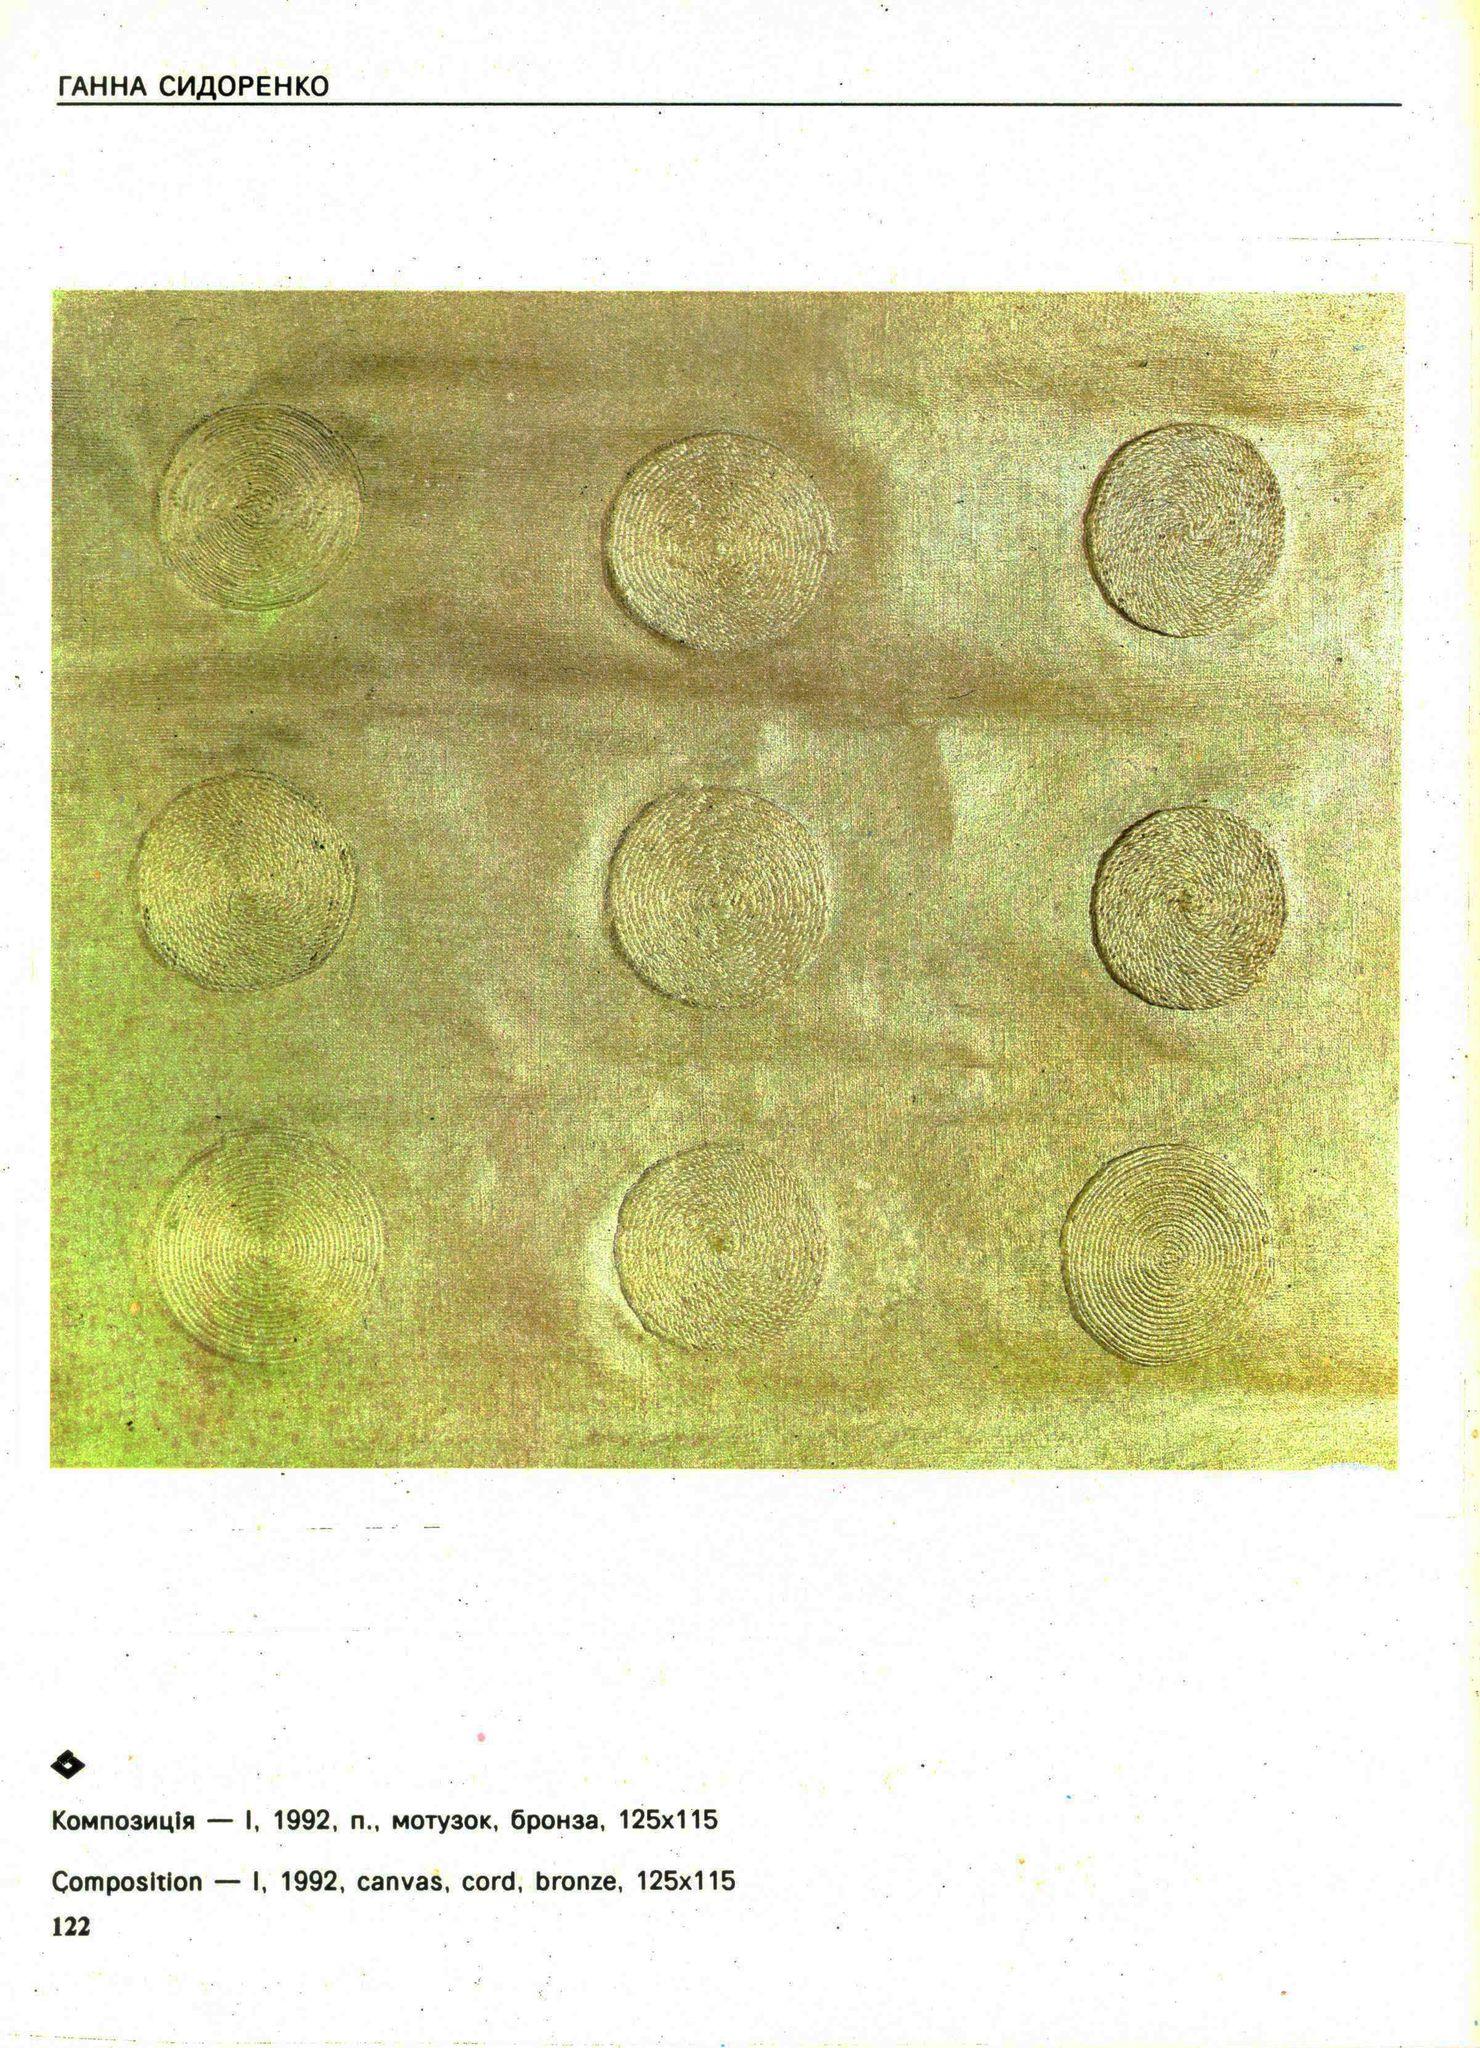 Анна Сидоренко. Виставка «Живописна пластика», 1994